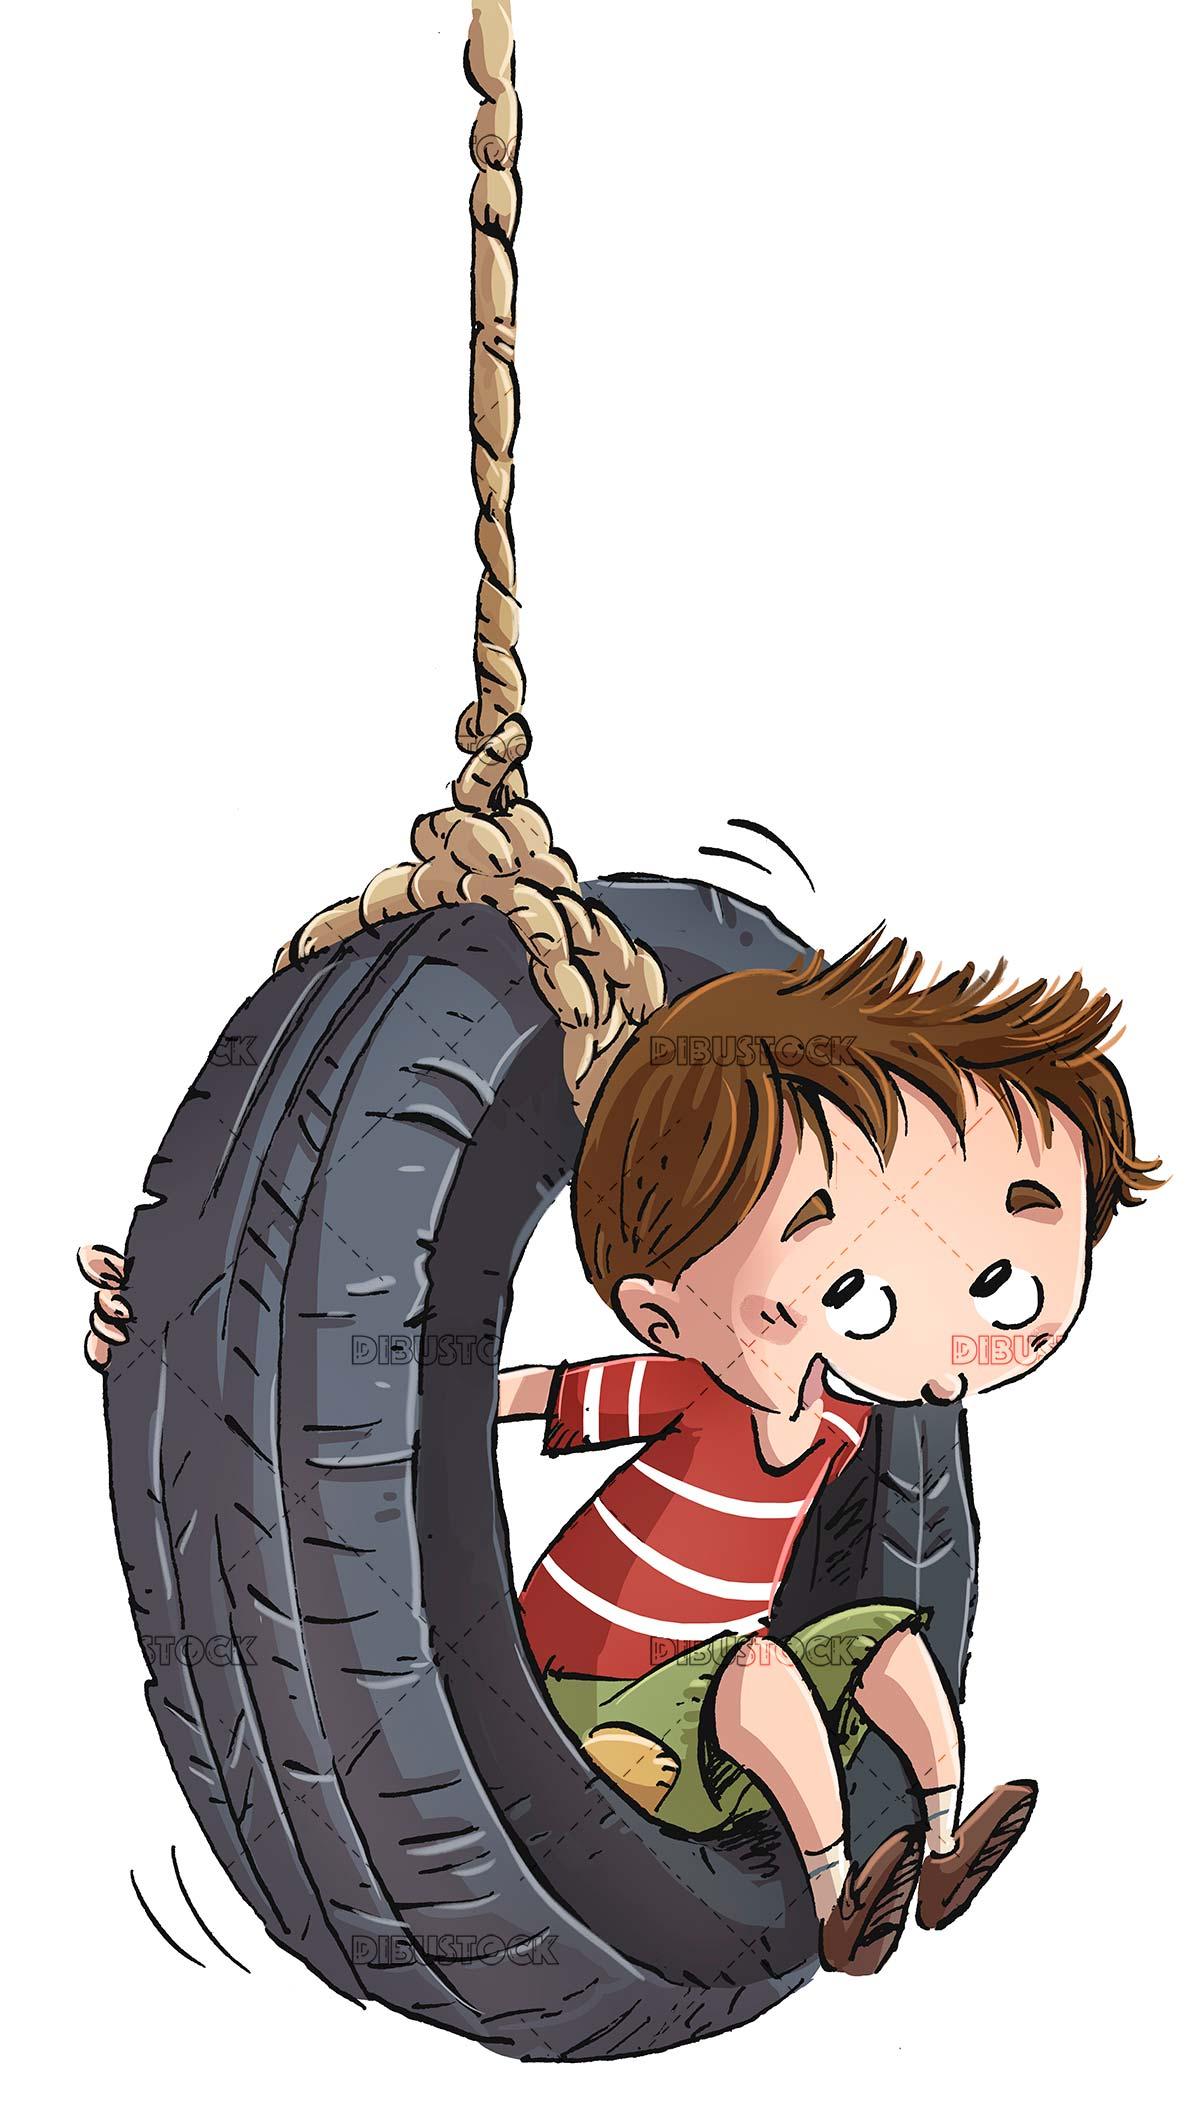 boy sitting on a car wheel as if it were a swing